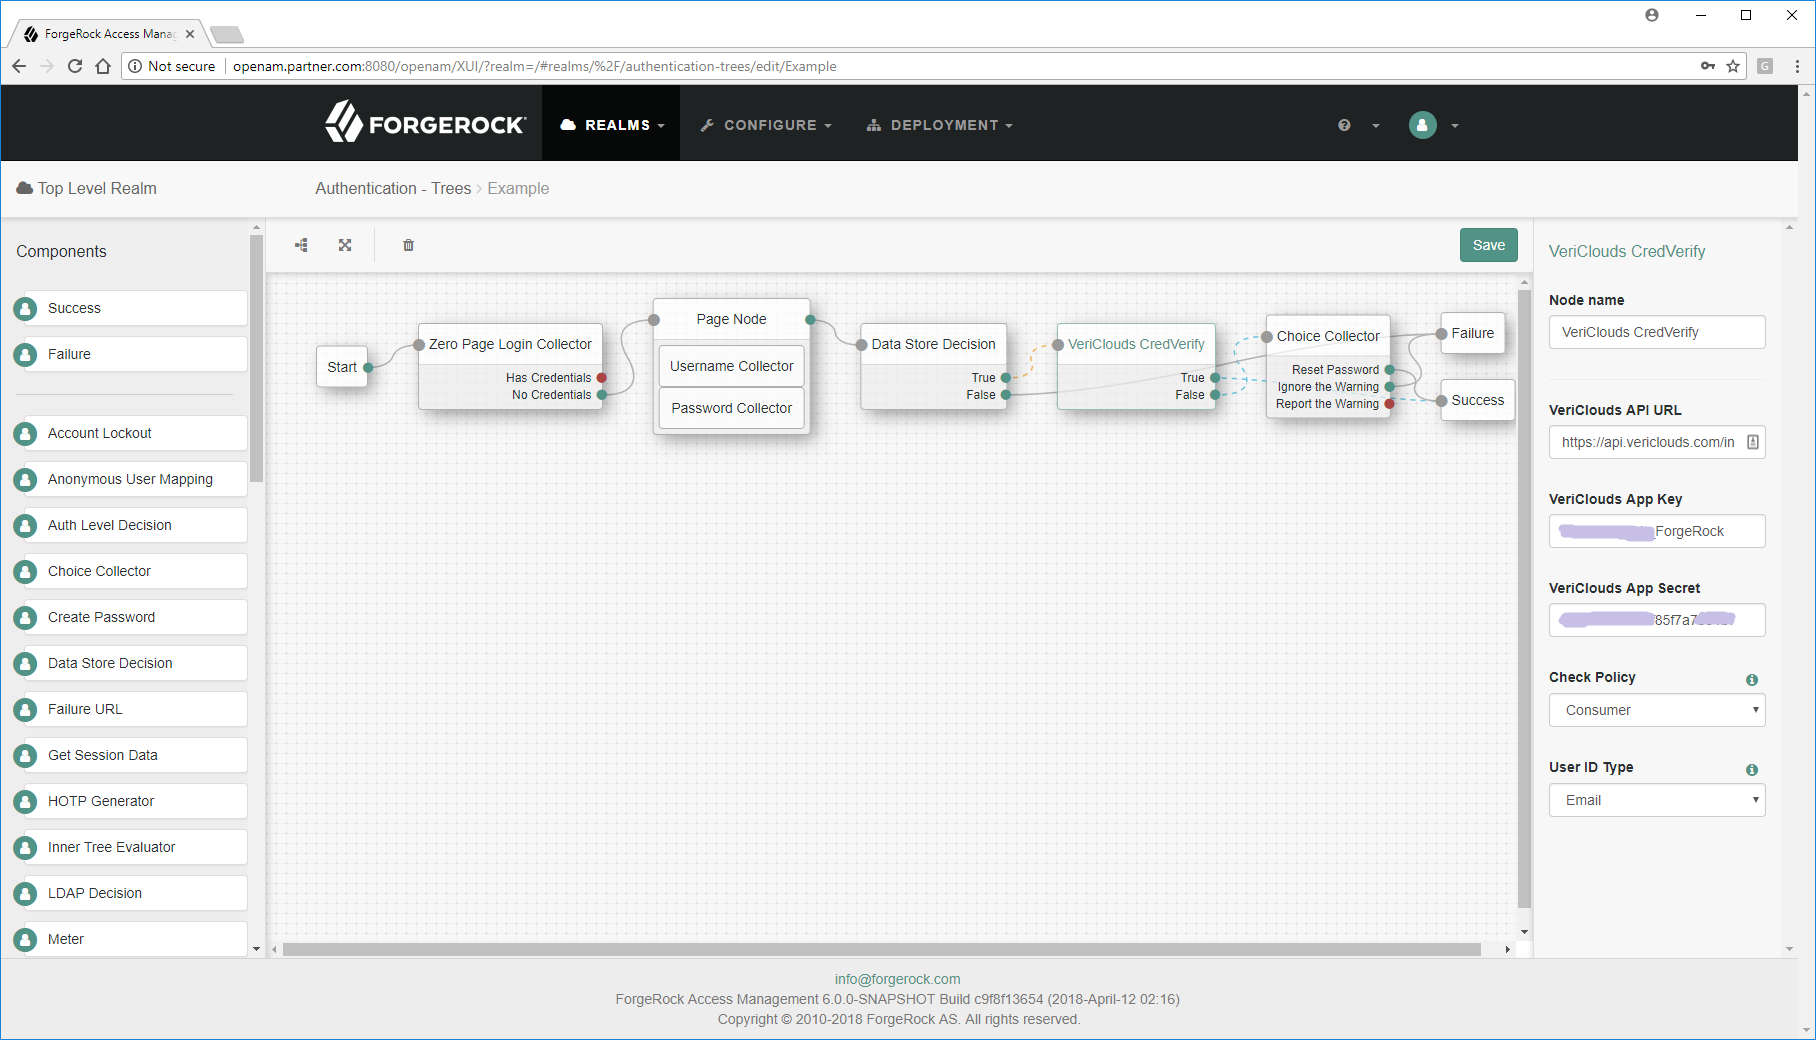 Configure Authentication Tree with CredVerify Node